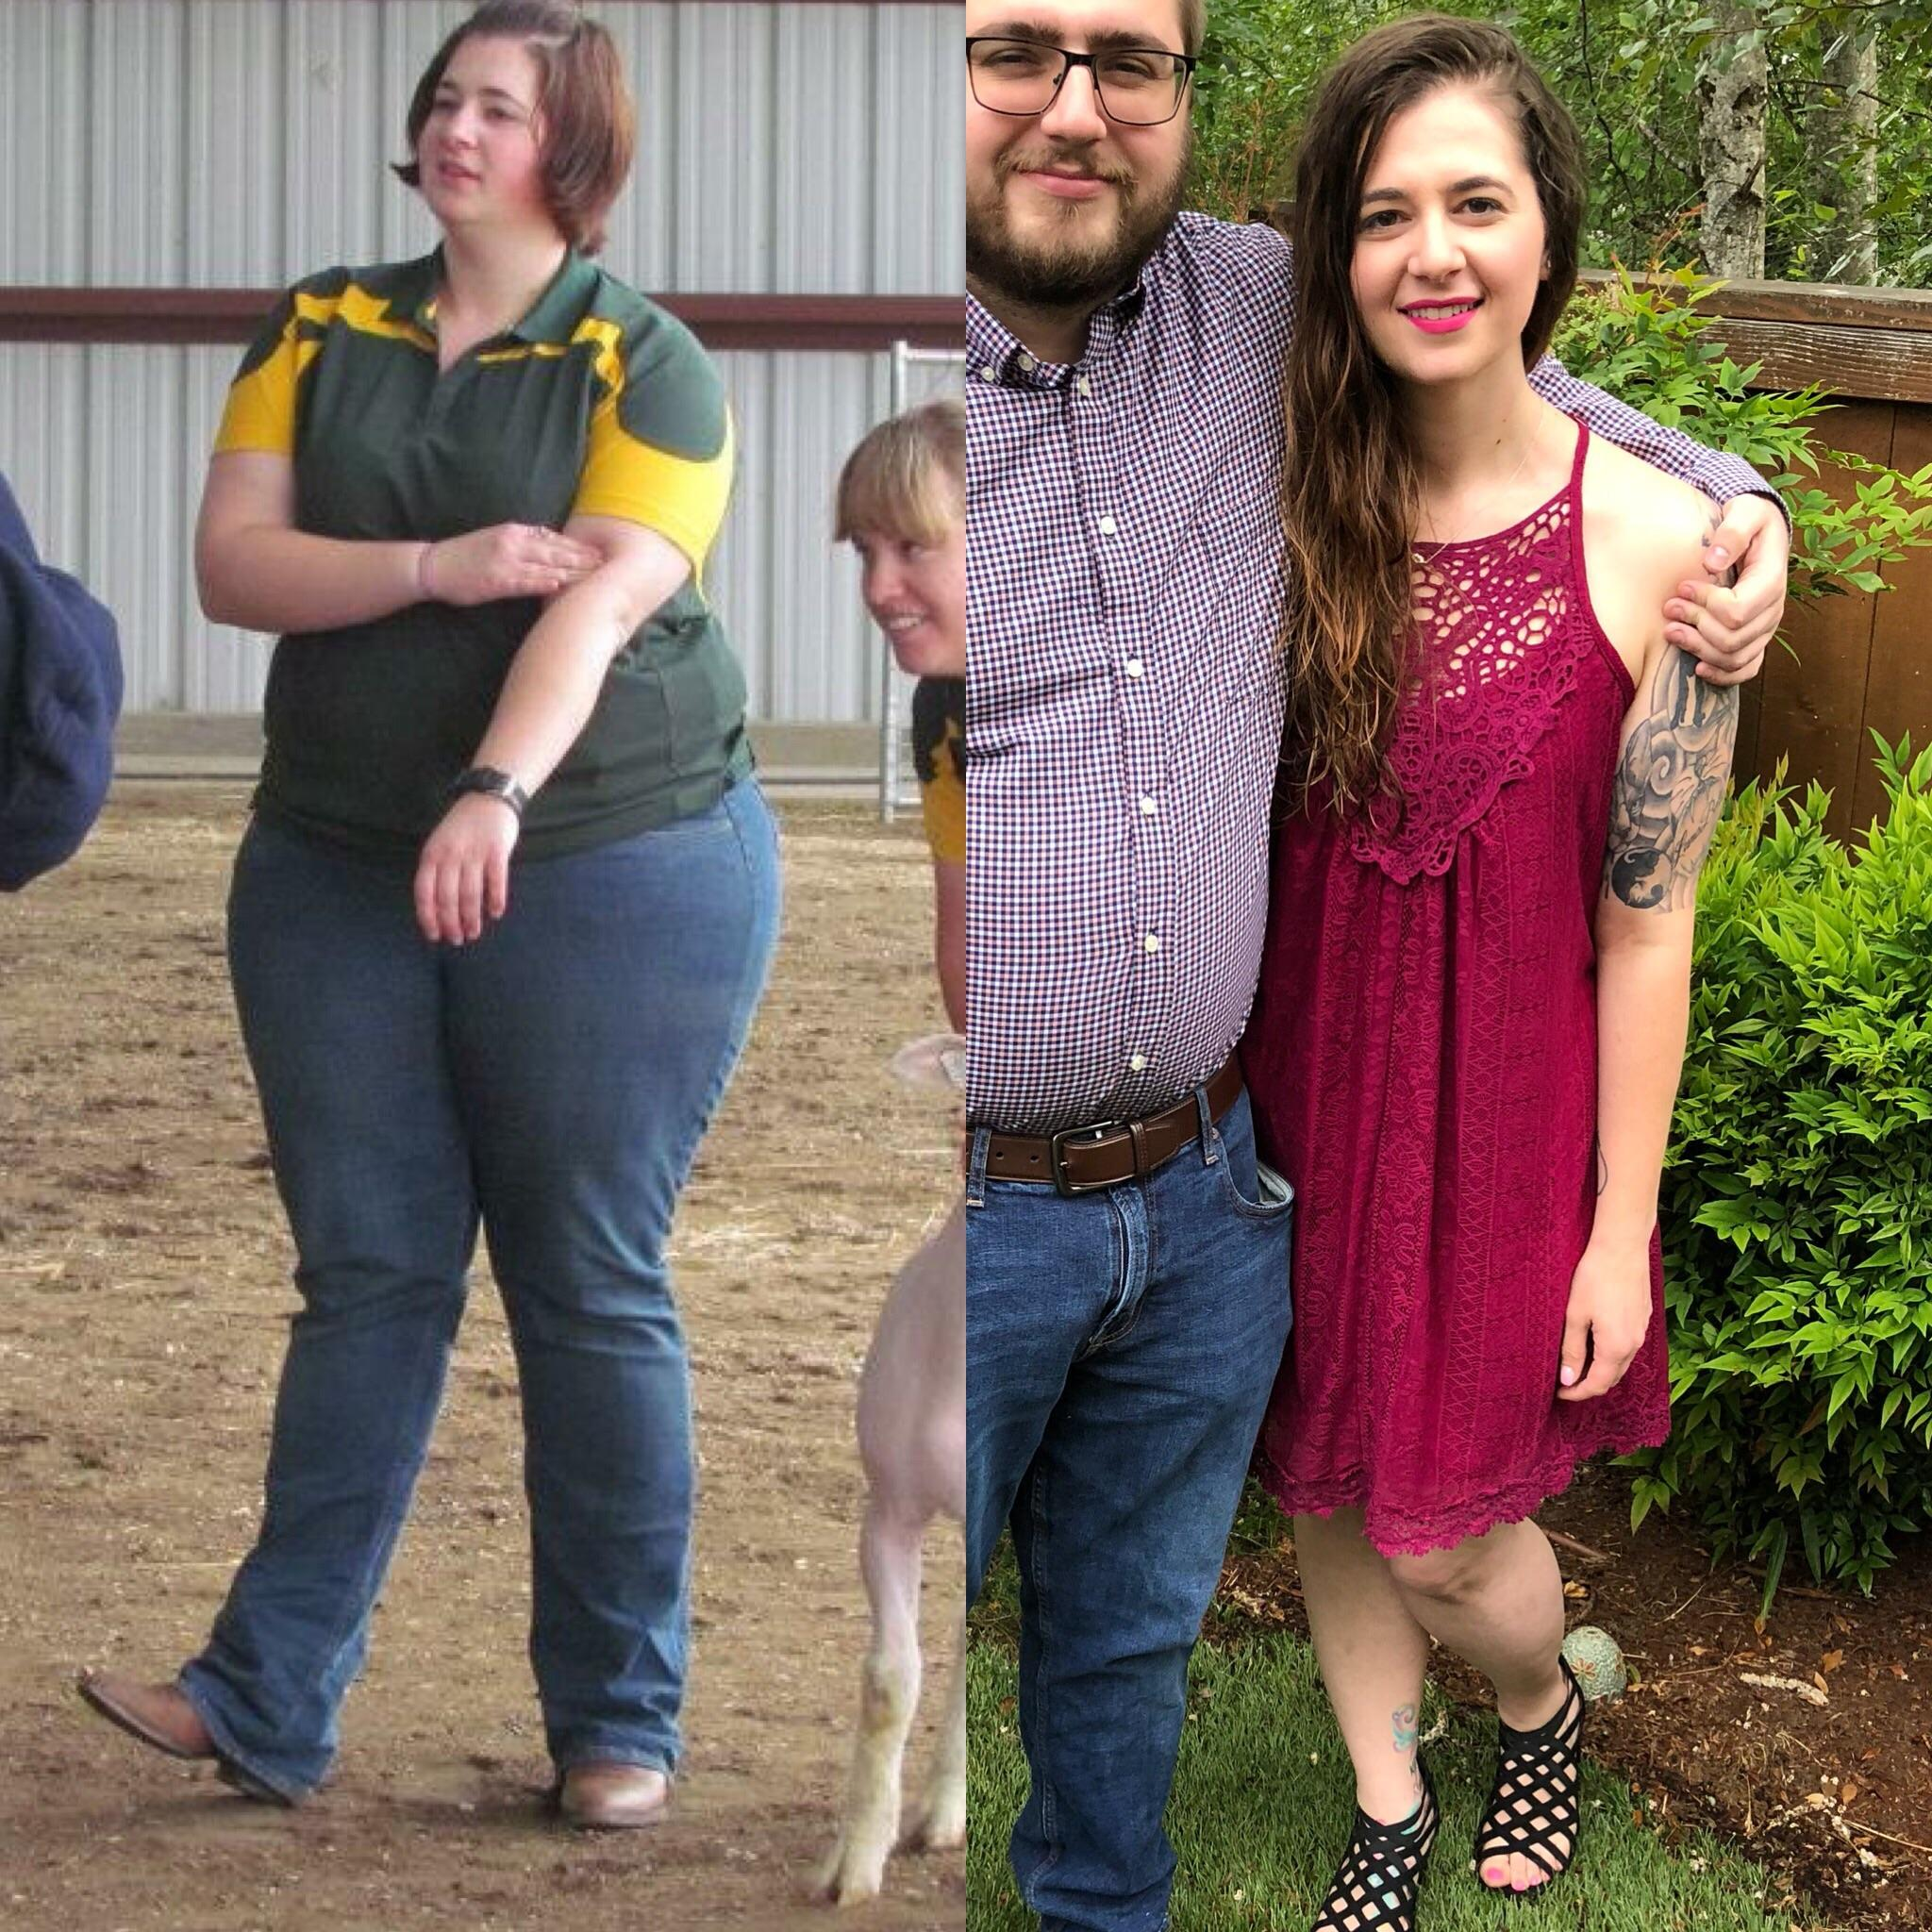 5'8 Female 141 lbs Fat Loss 330 lbs to 189 lbs